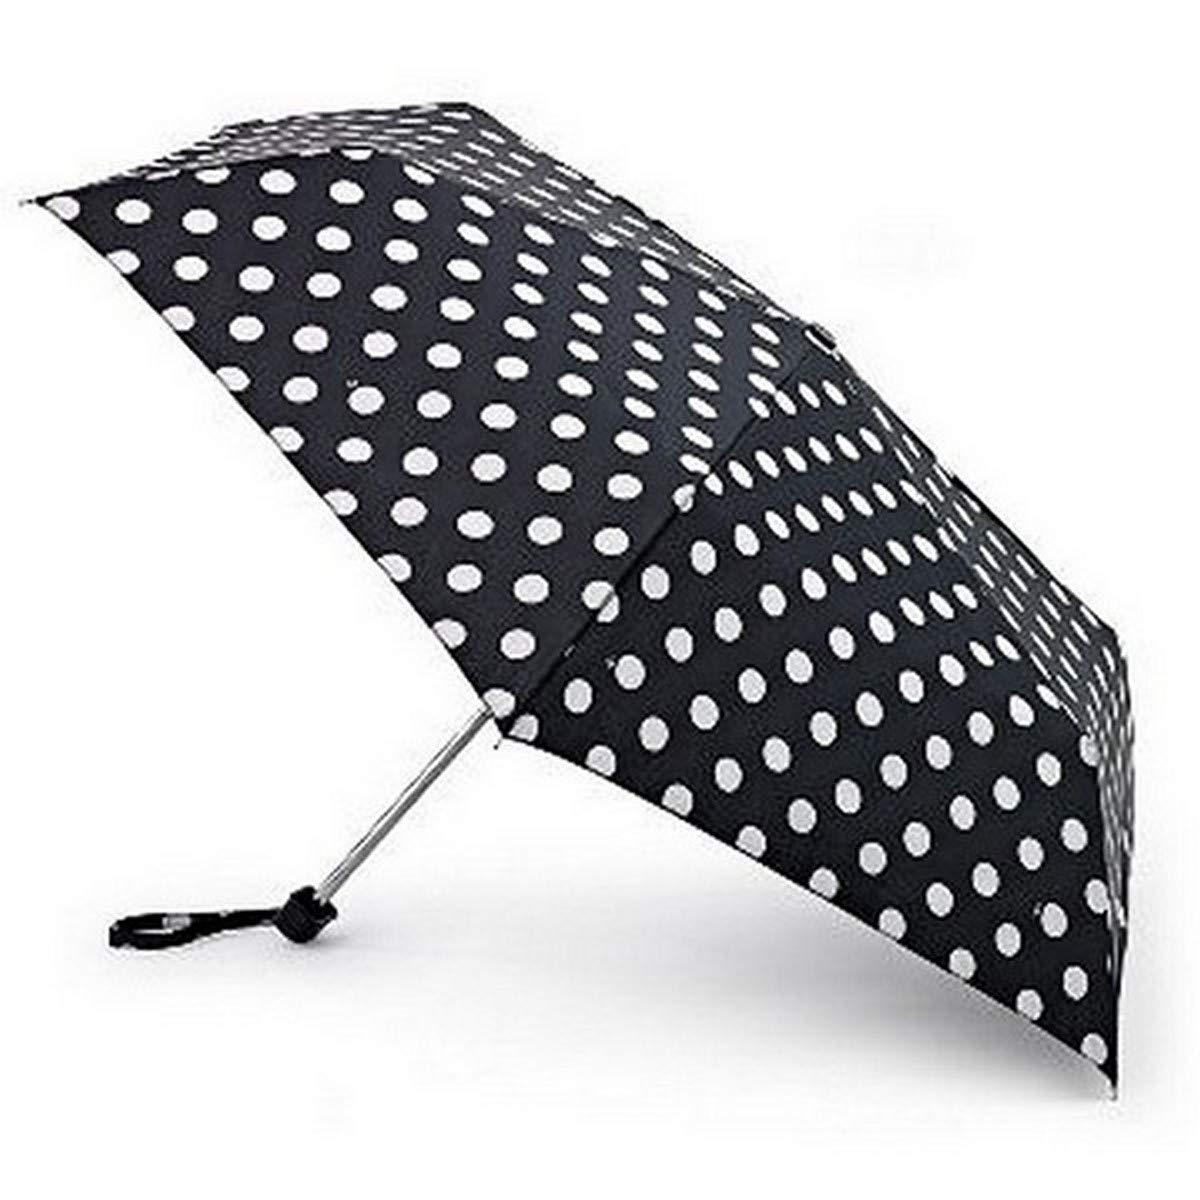 Fulton Miniflat 2 Women's Umbrella Big Spot Print